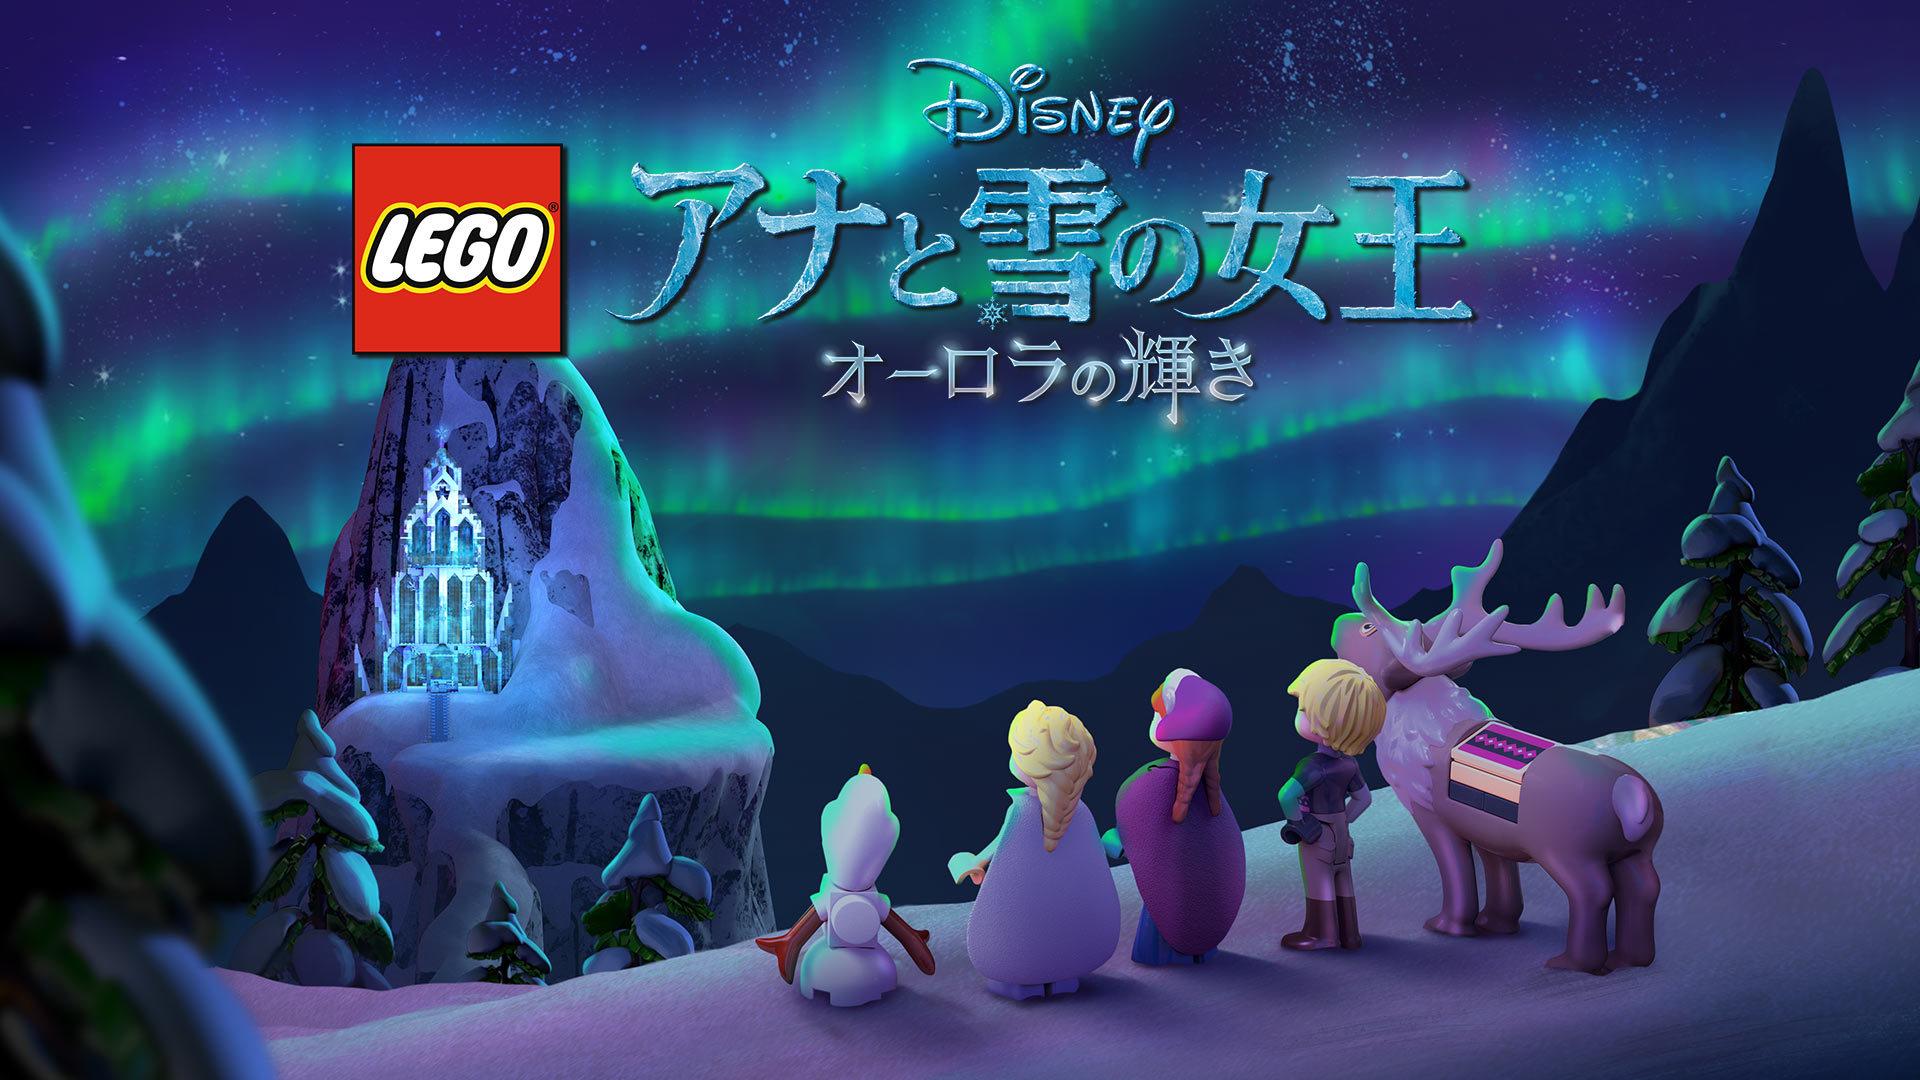 「LEGO アナと雪の女王 オーロラの輝き」(C)2019 Disney